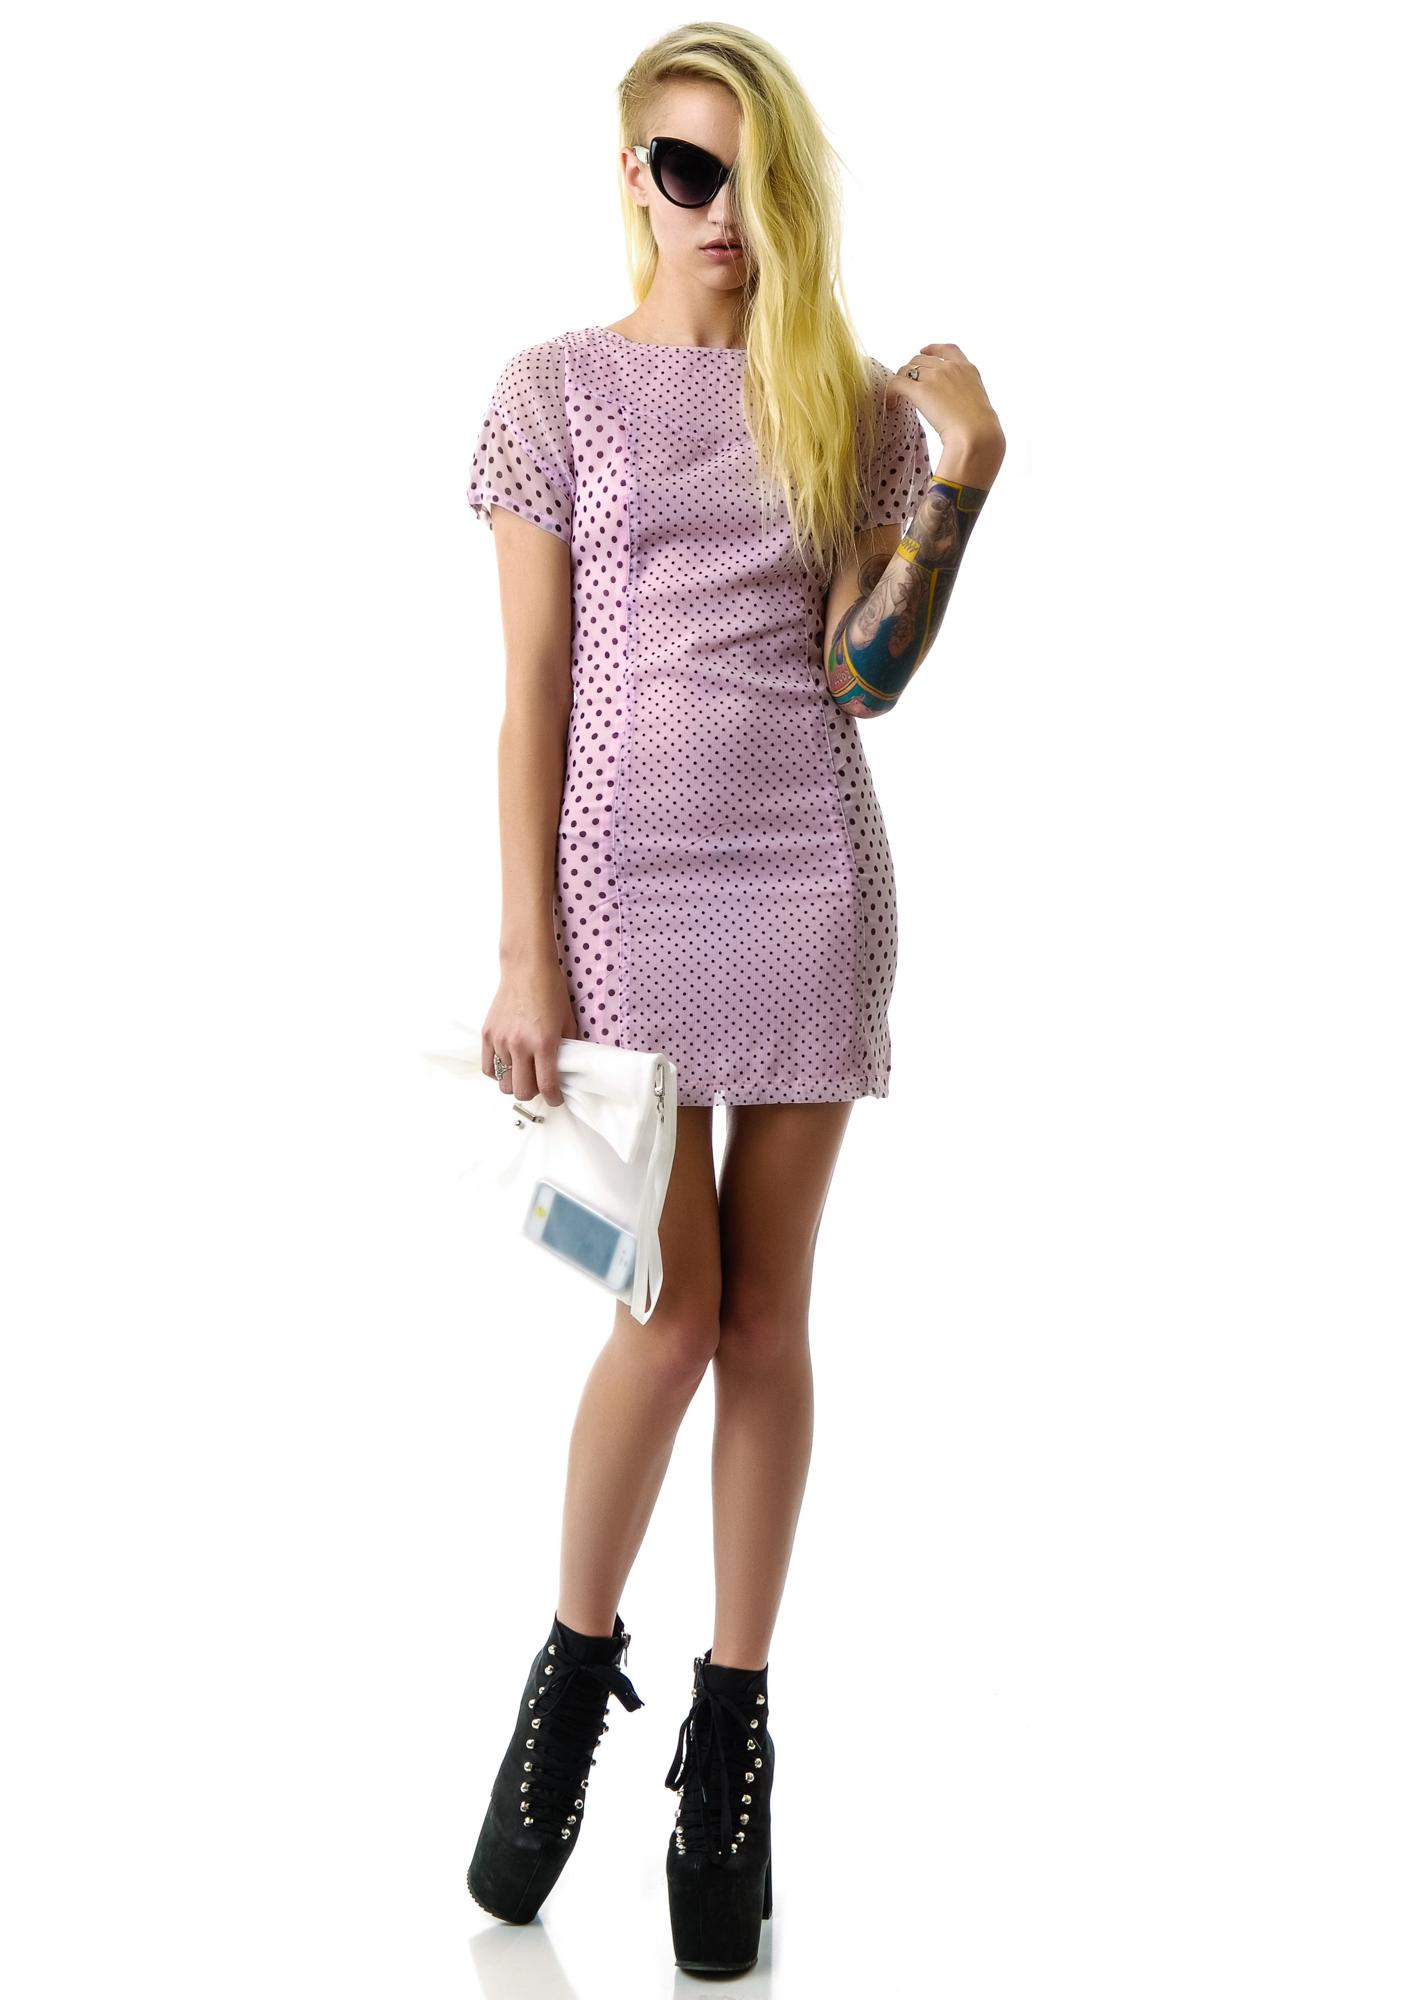 One Teaspoon Mean Cat Dress